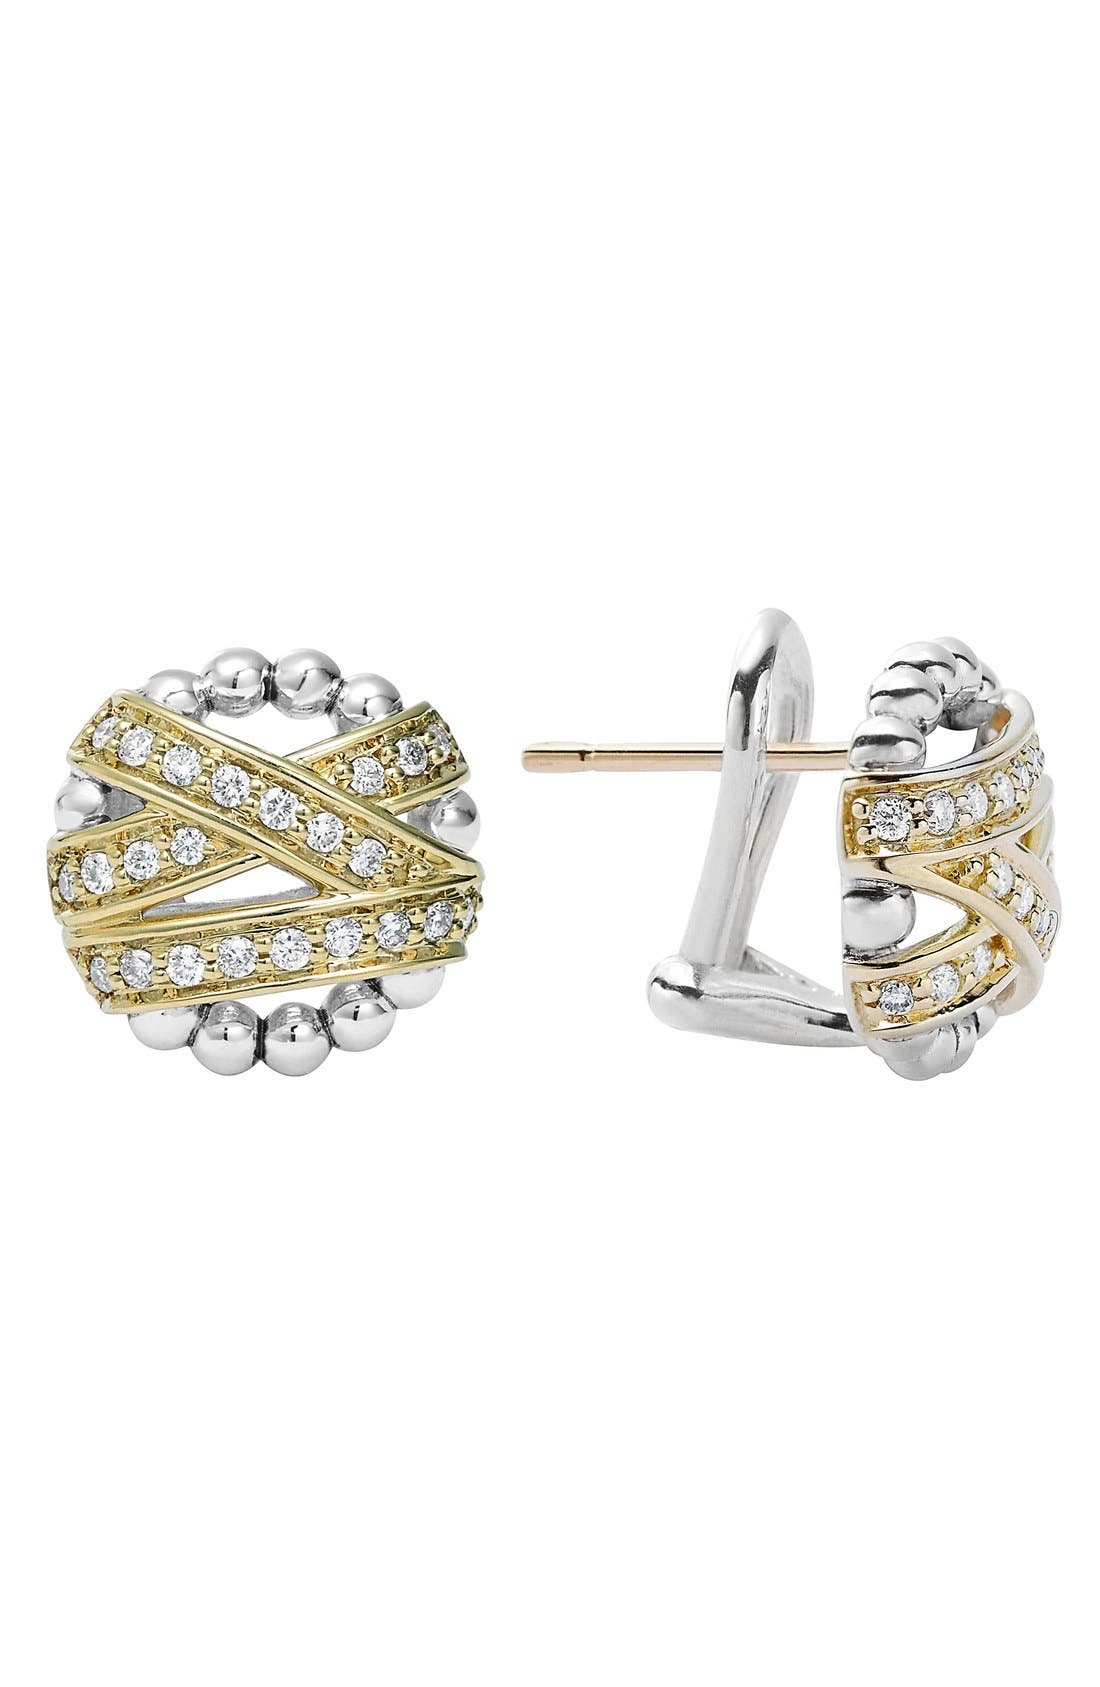 Alternate Image 1 Selected - LAGOS 'Diamonds & Caviar' Diamond Stud Earrings